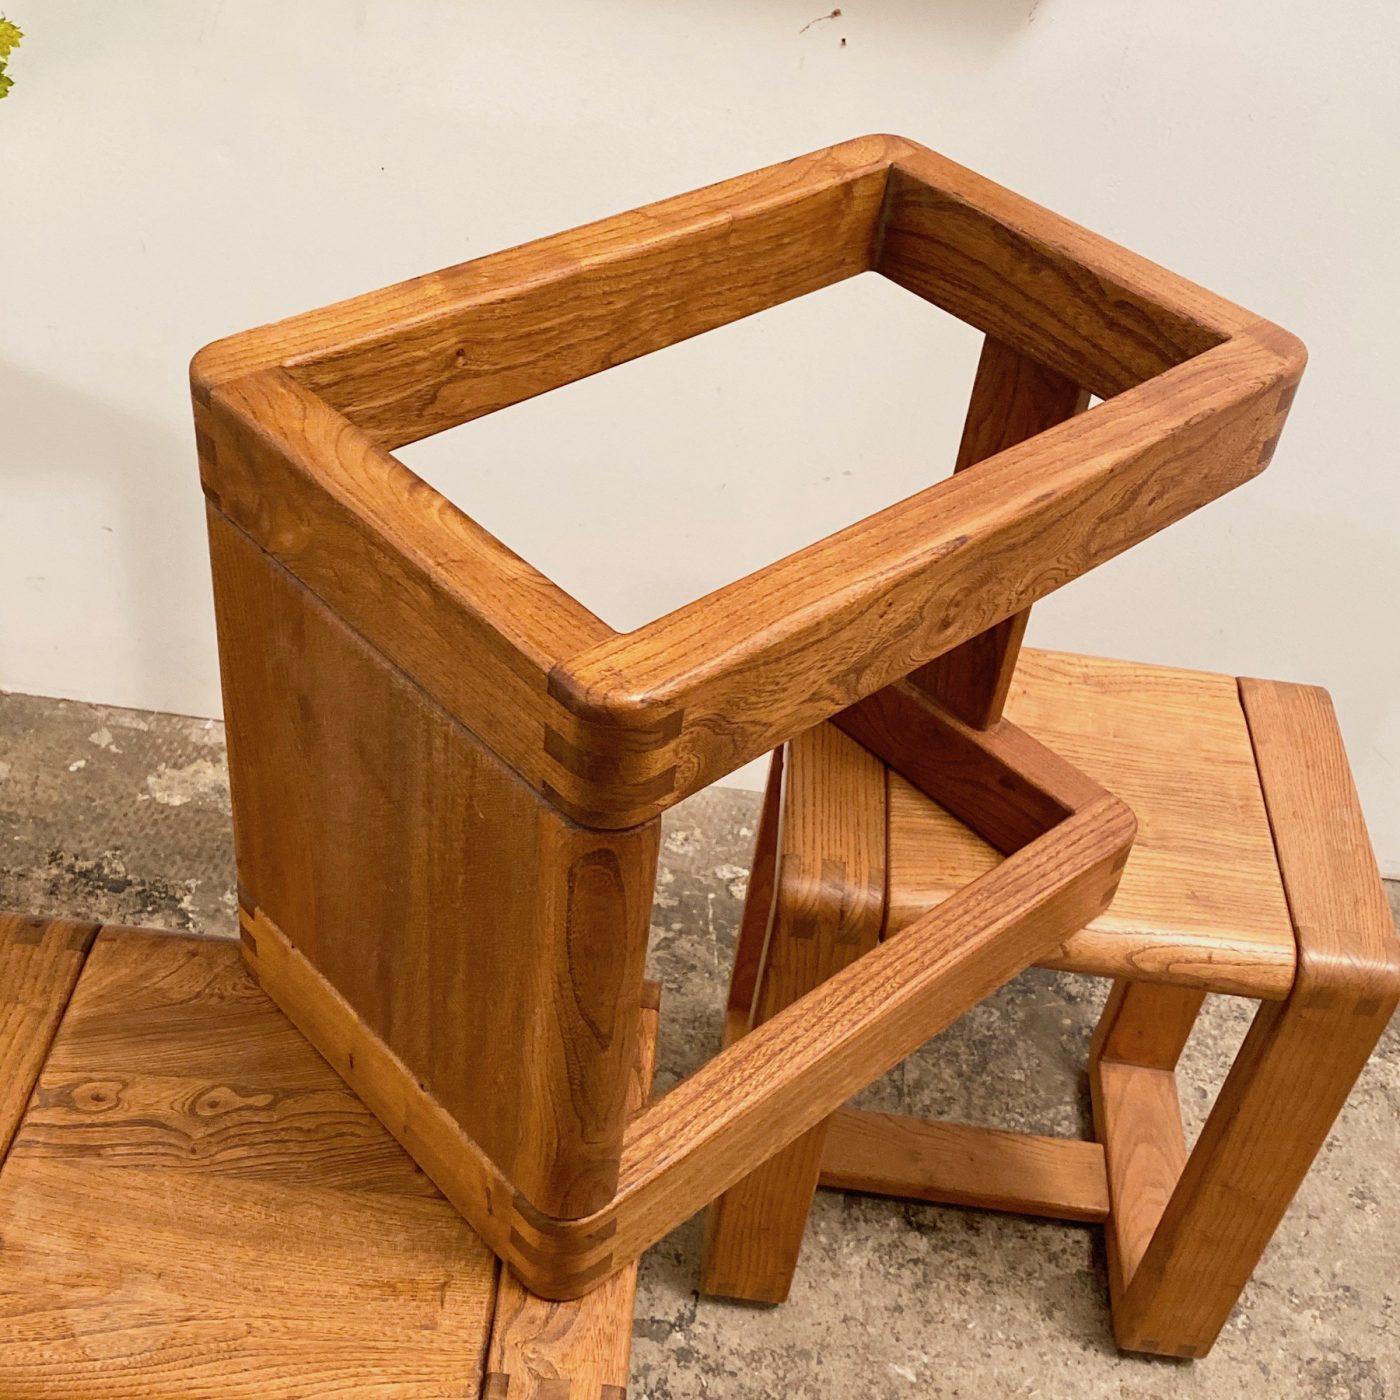 objet-vagabond-massive-stools0006